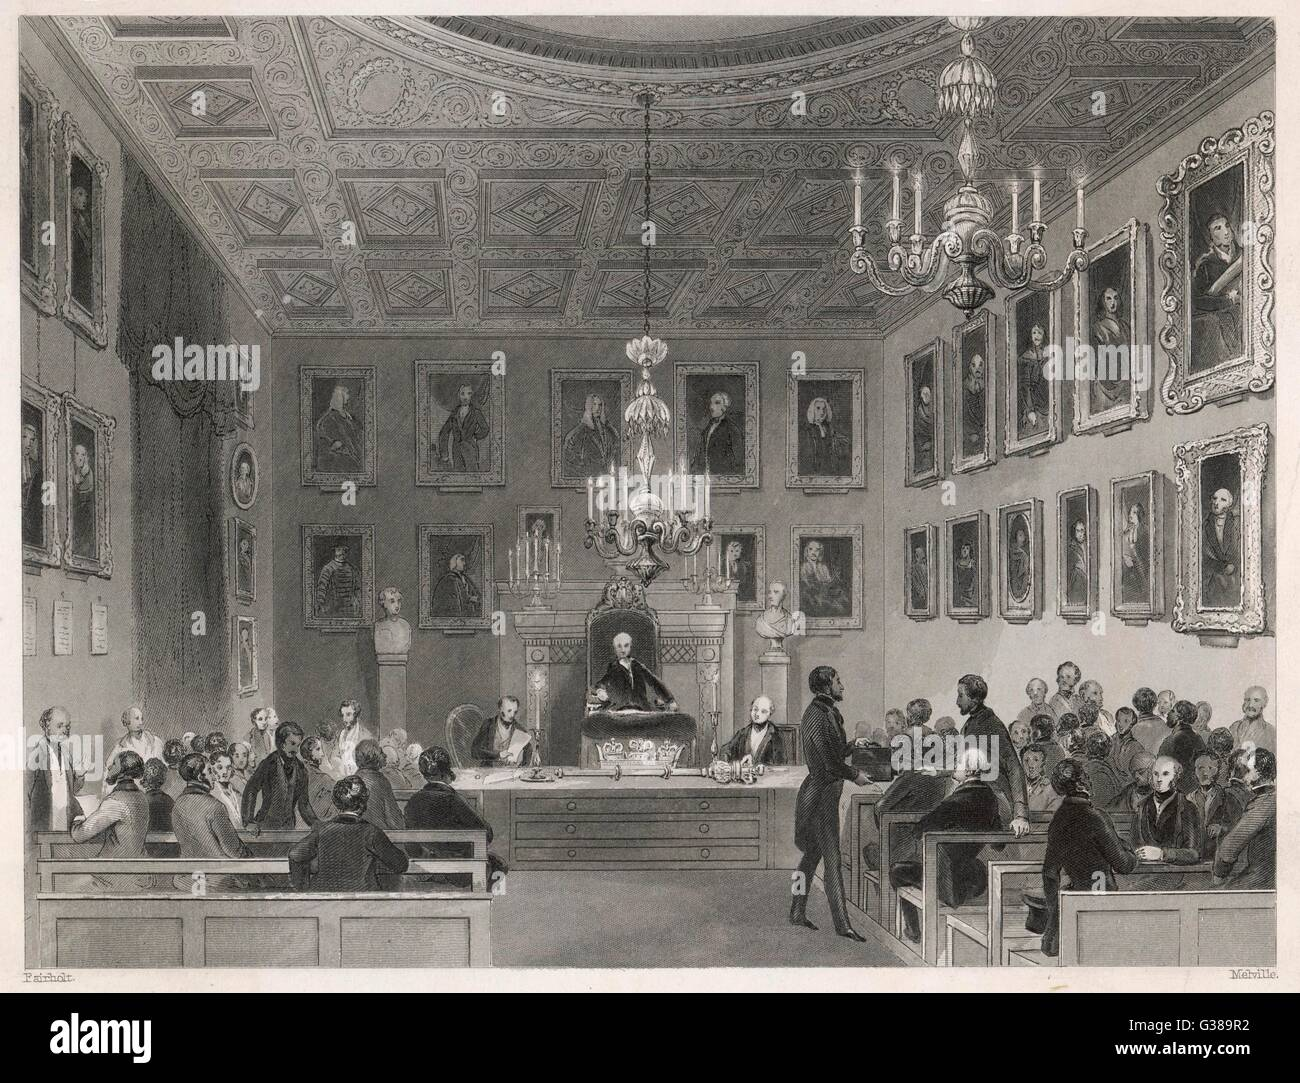 Una reunión celebrada en Somerset House, Londres. Fecha: 1840 Imagen De Stock